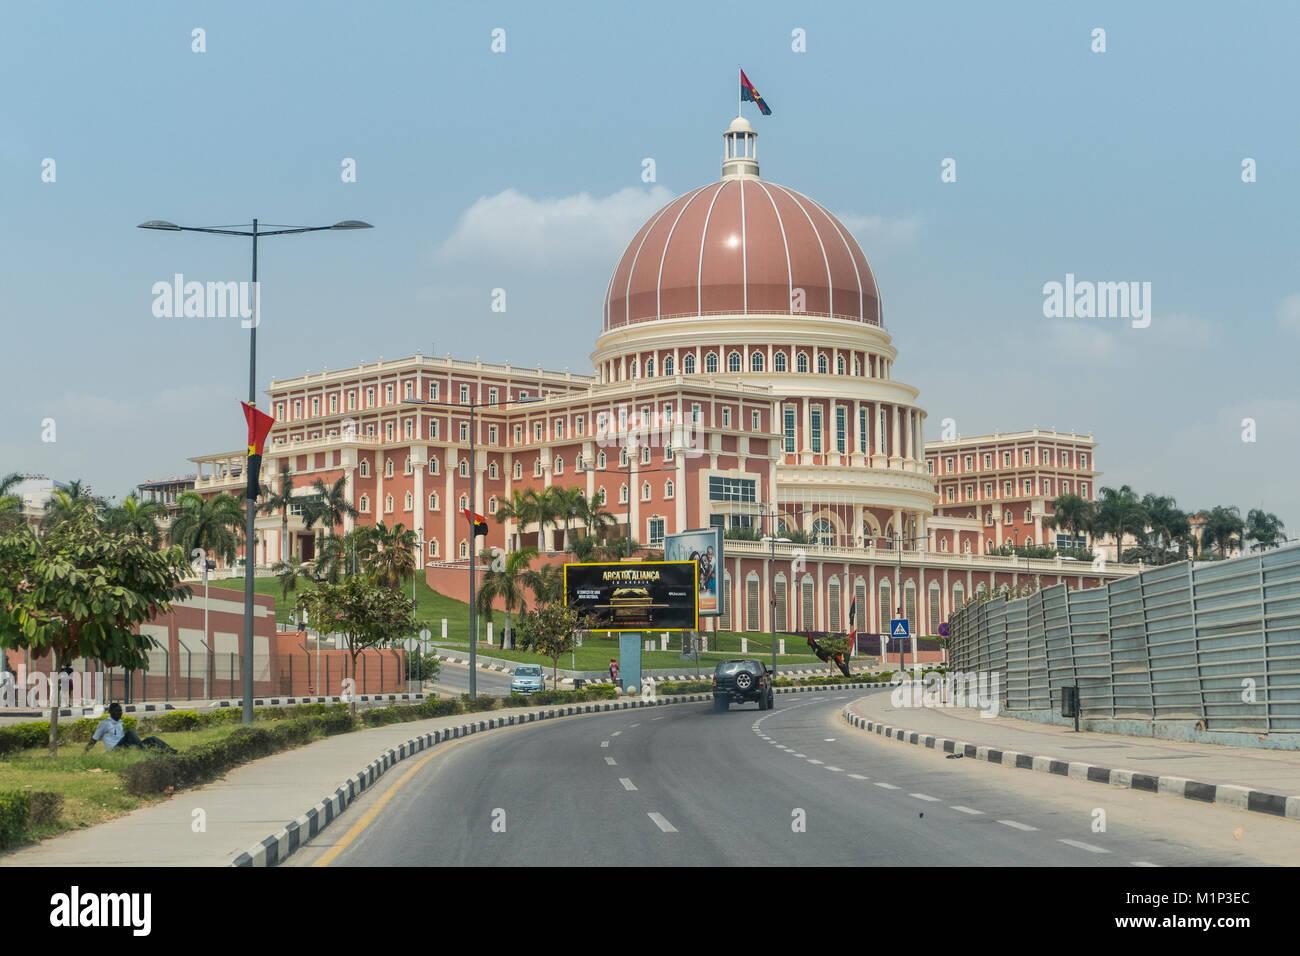 National Assembly of Angola, Luanda, Angola, Africa Stock Photo